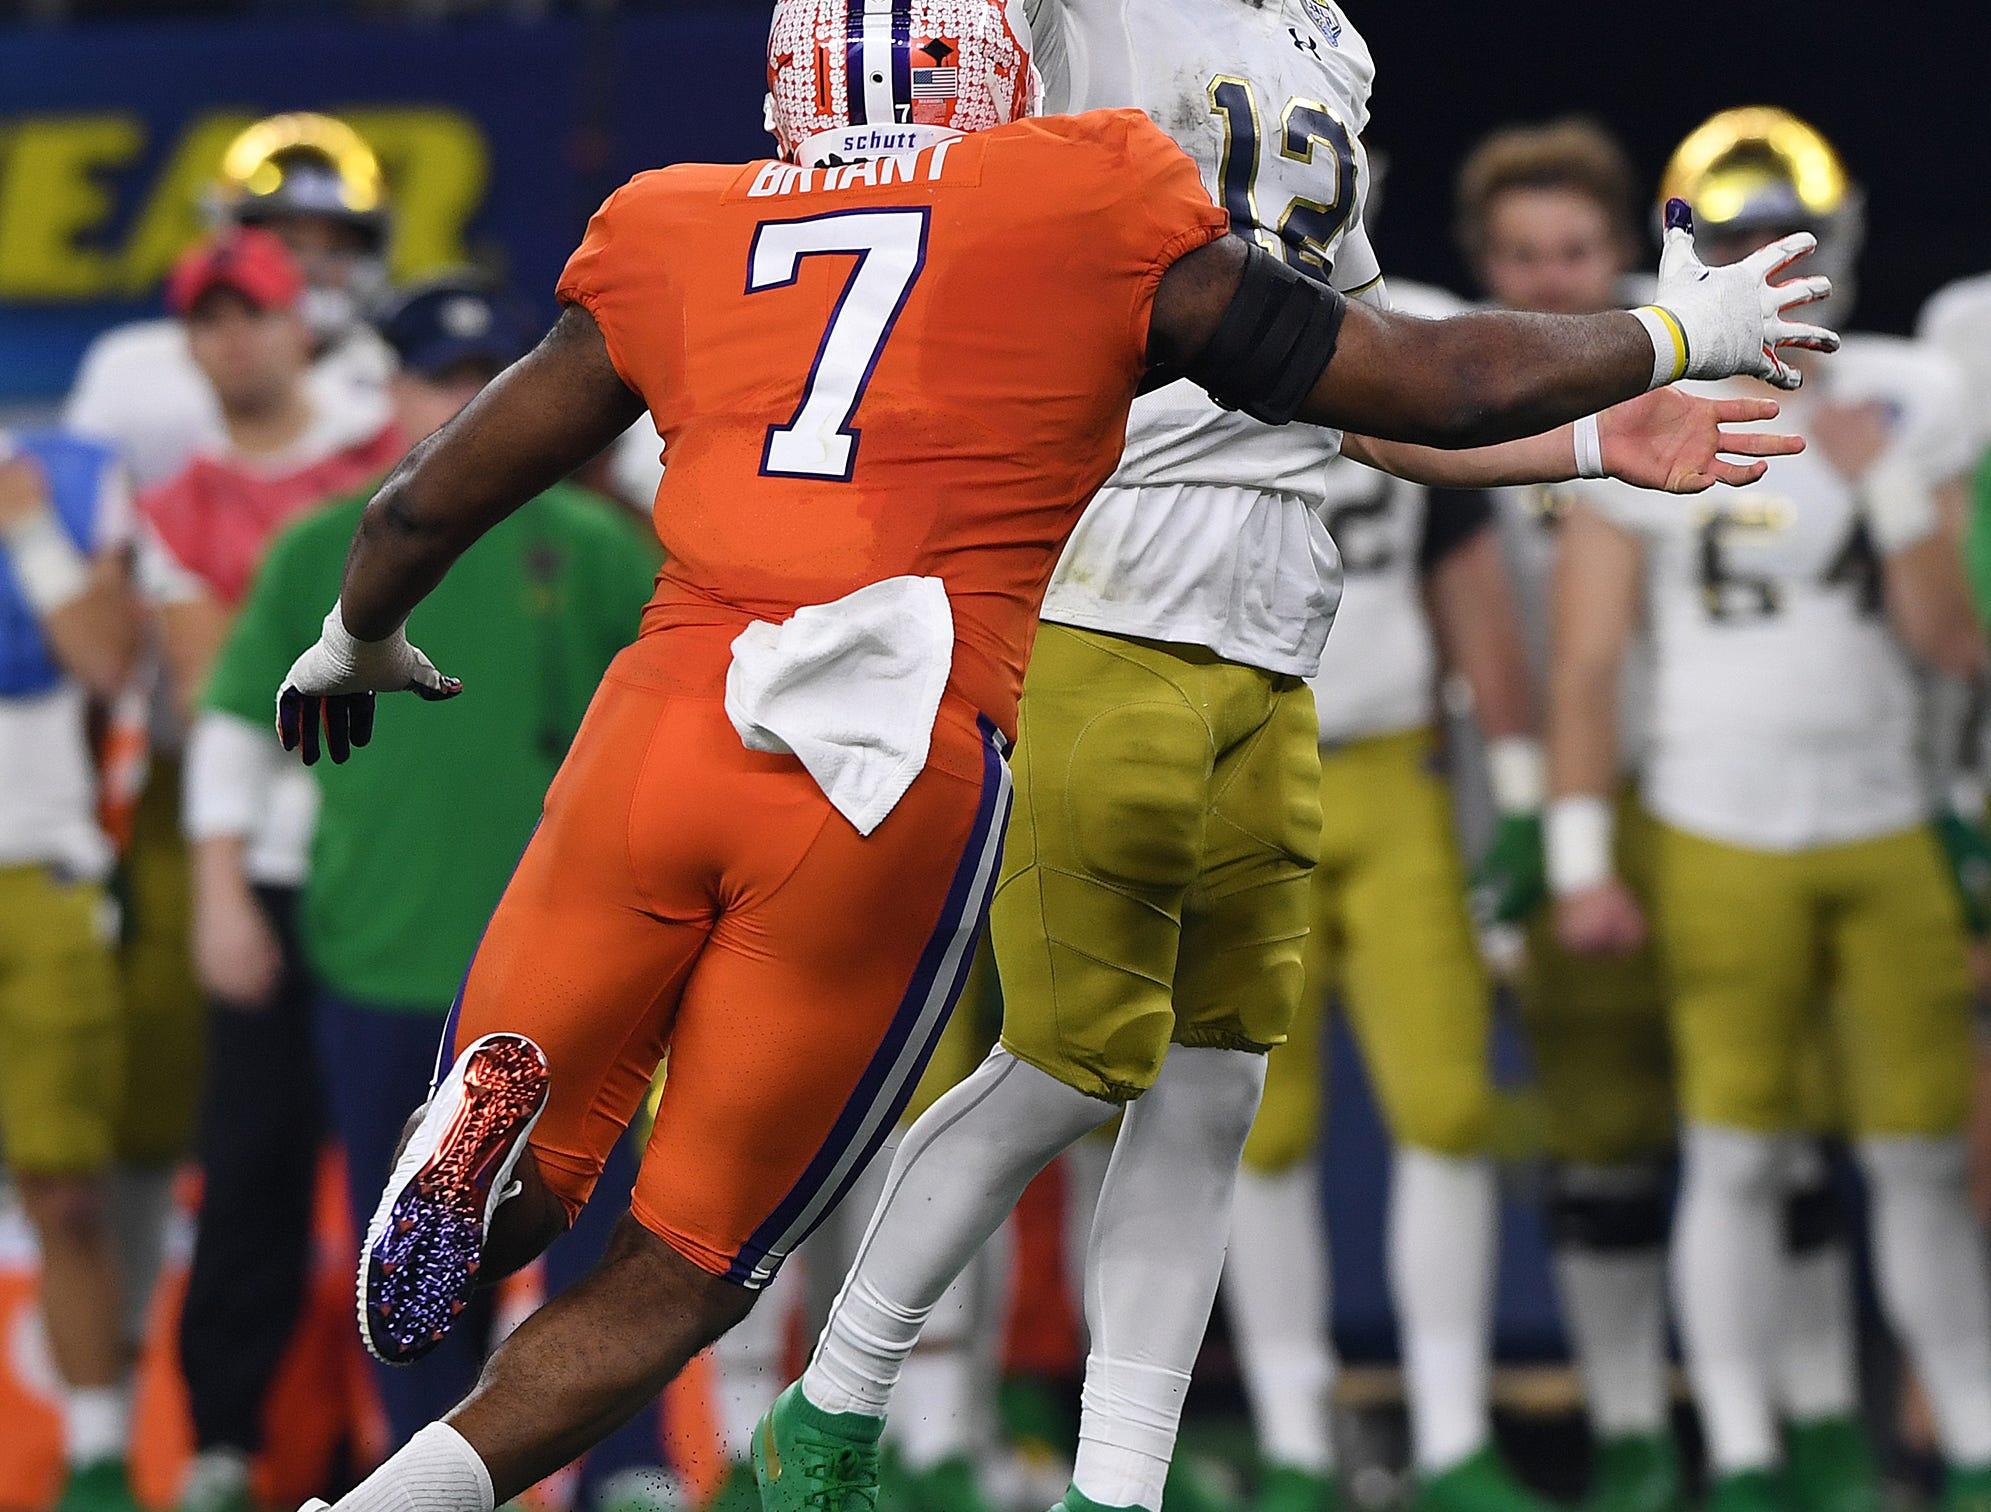 Clemson defensive lineman Austin Bryant (7) pressures Notre Dame quarterback Ian Book (12) during the 3rd quarter of the Goodyear Cotton Bowl at AT&T stadium in Arlington, TX Saturday, December 29, 2018.